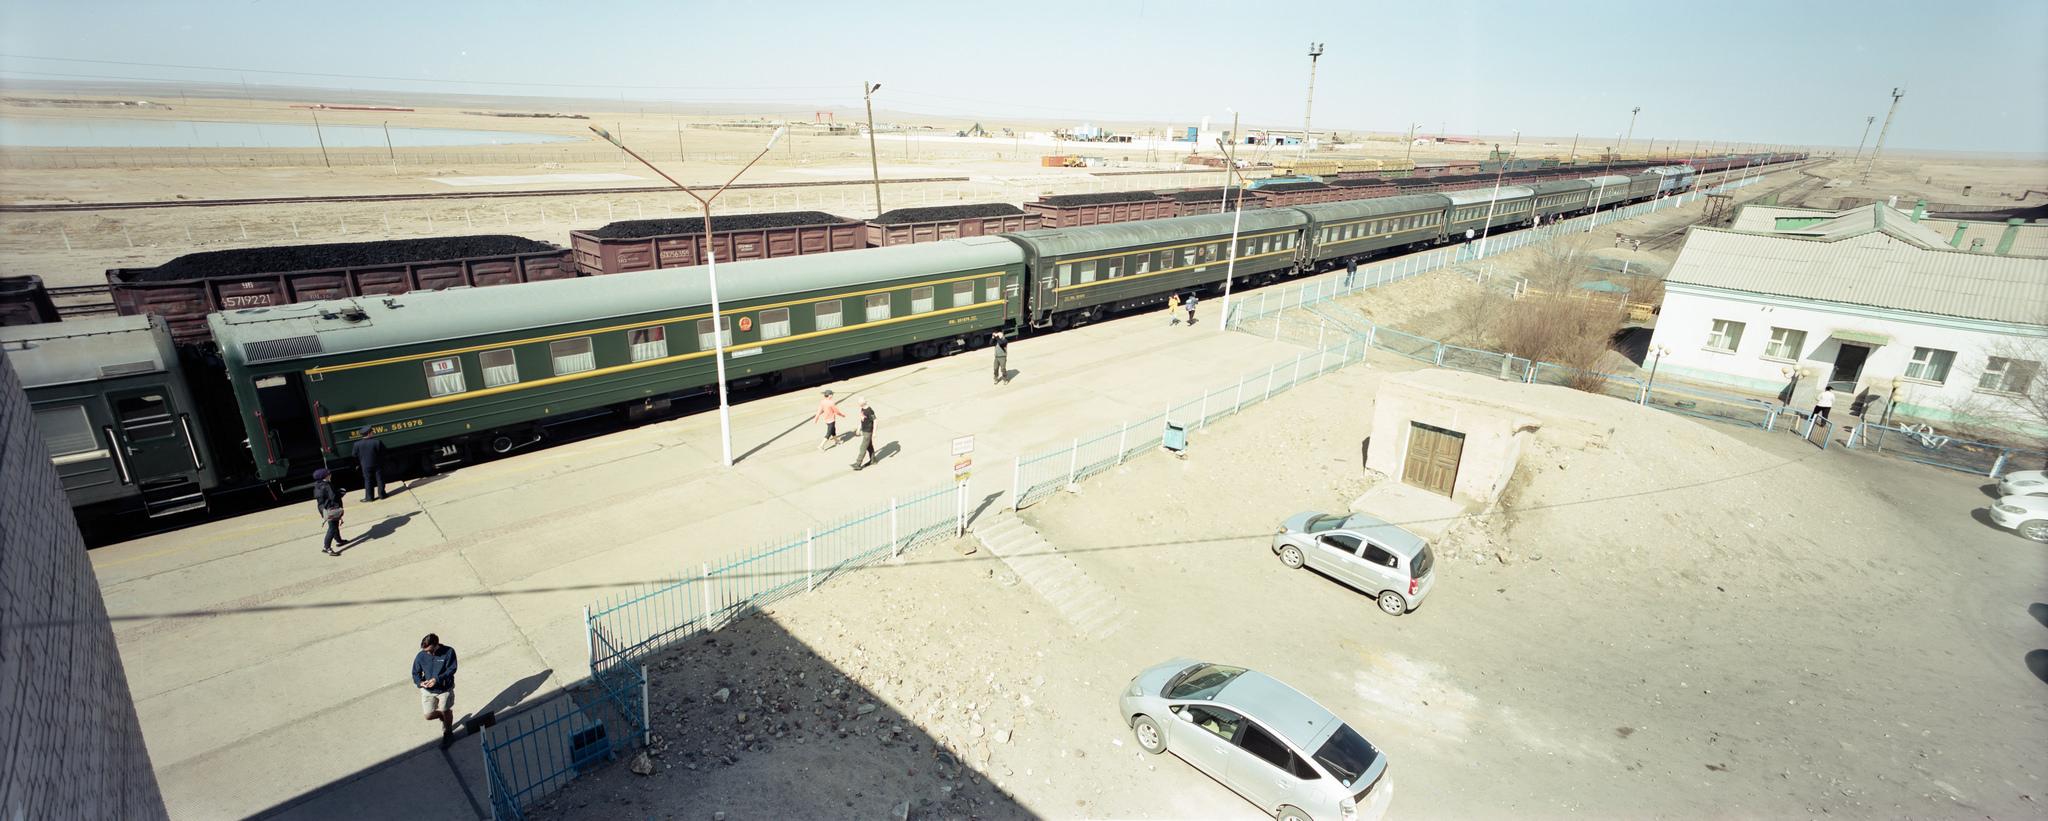 Our train in Choir P614   58mm Super Angulon   Fuji Provia 100f